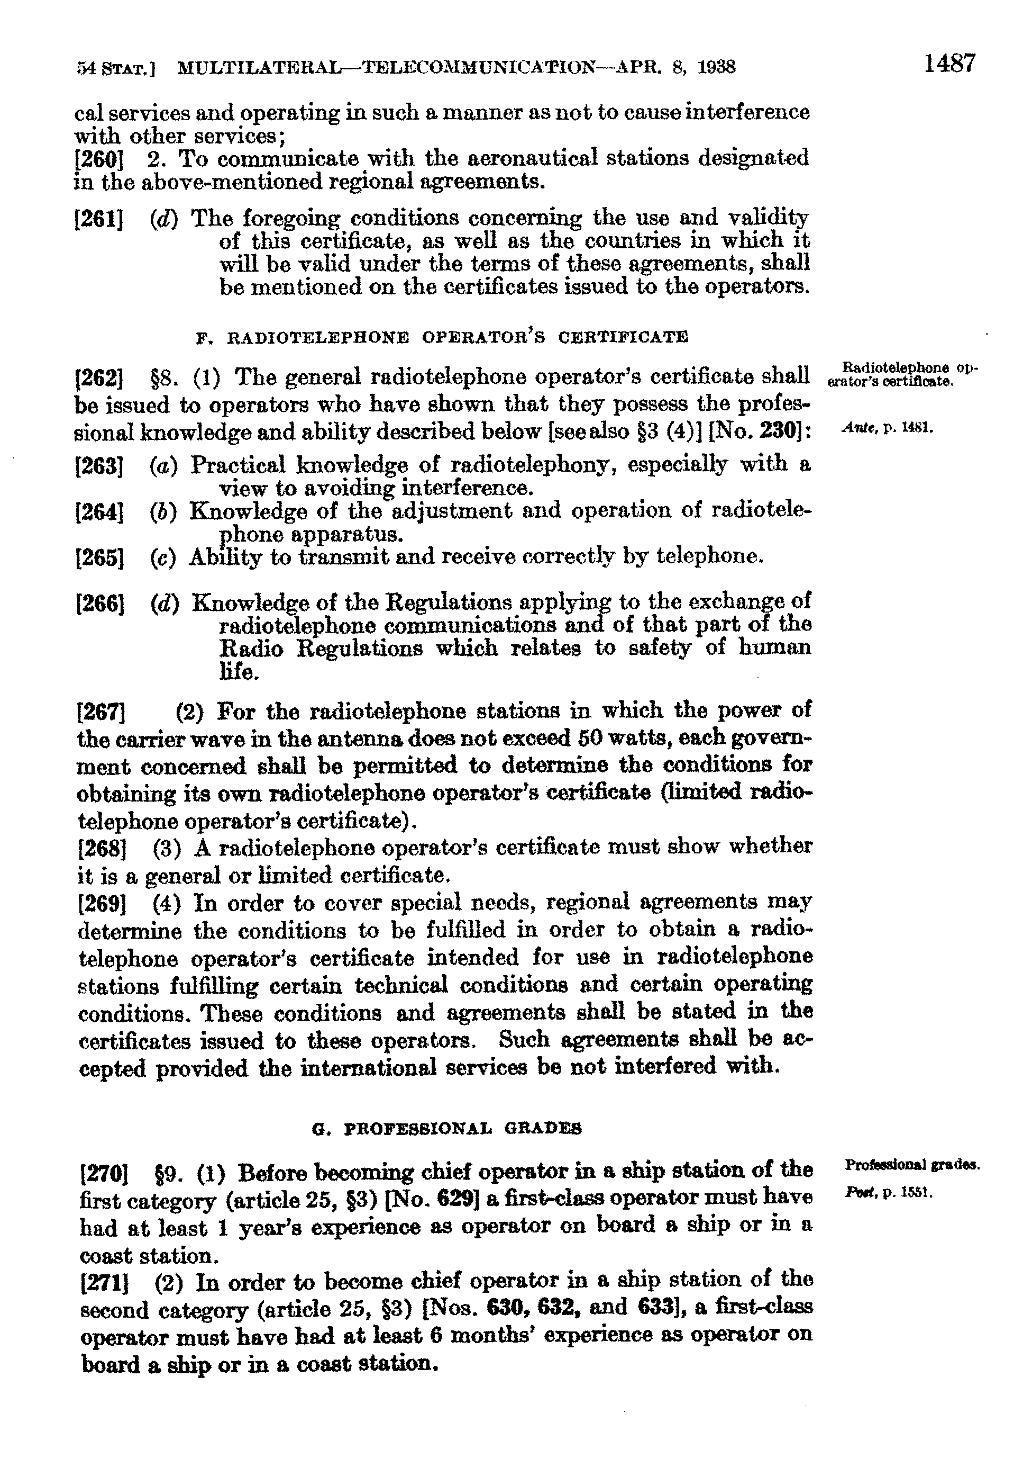 Part P Certificate >> Page United States Statutes At Large Volume 54 Part 2 Djvu